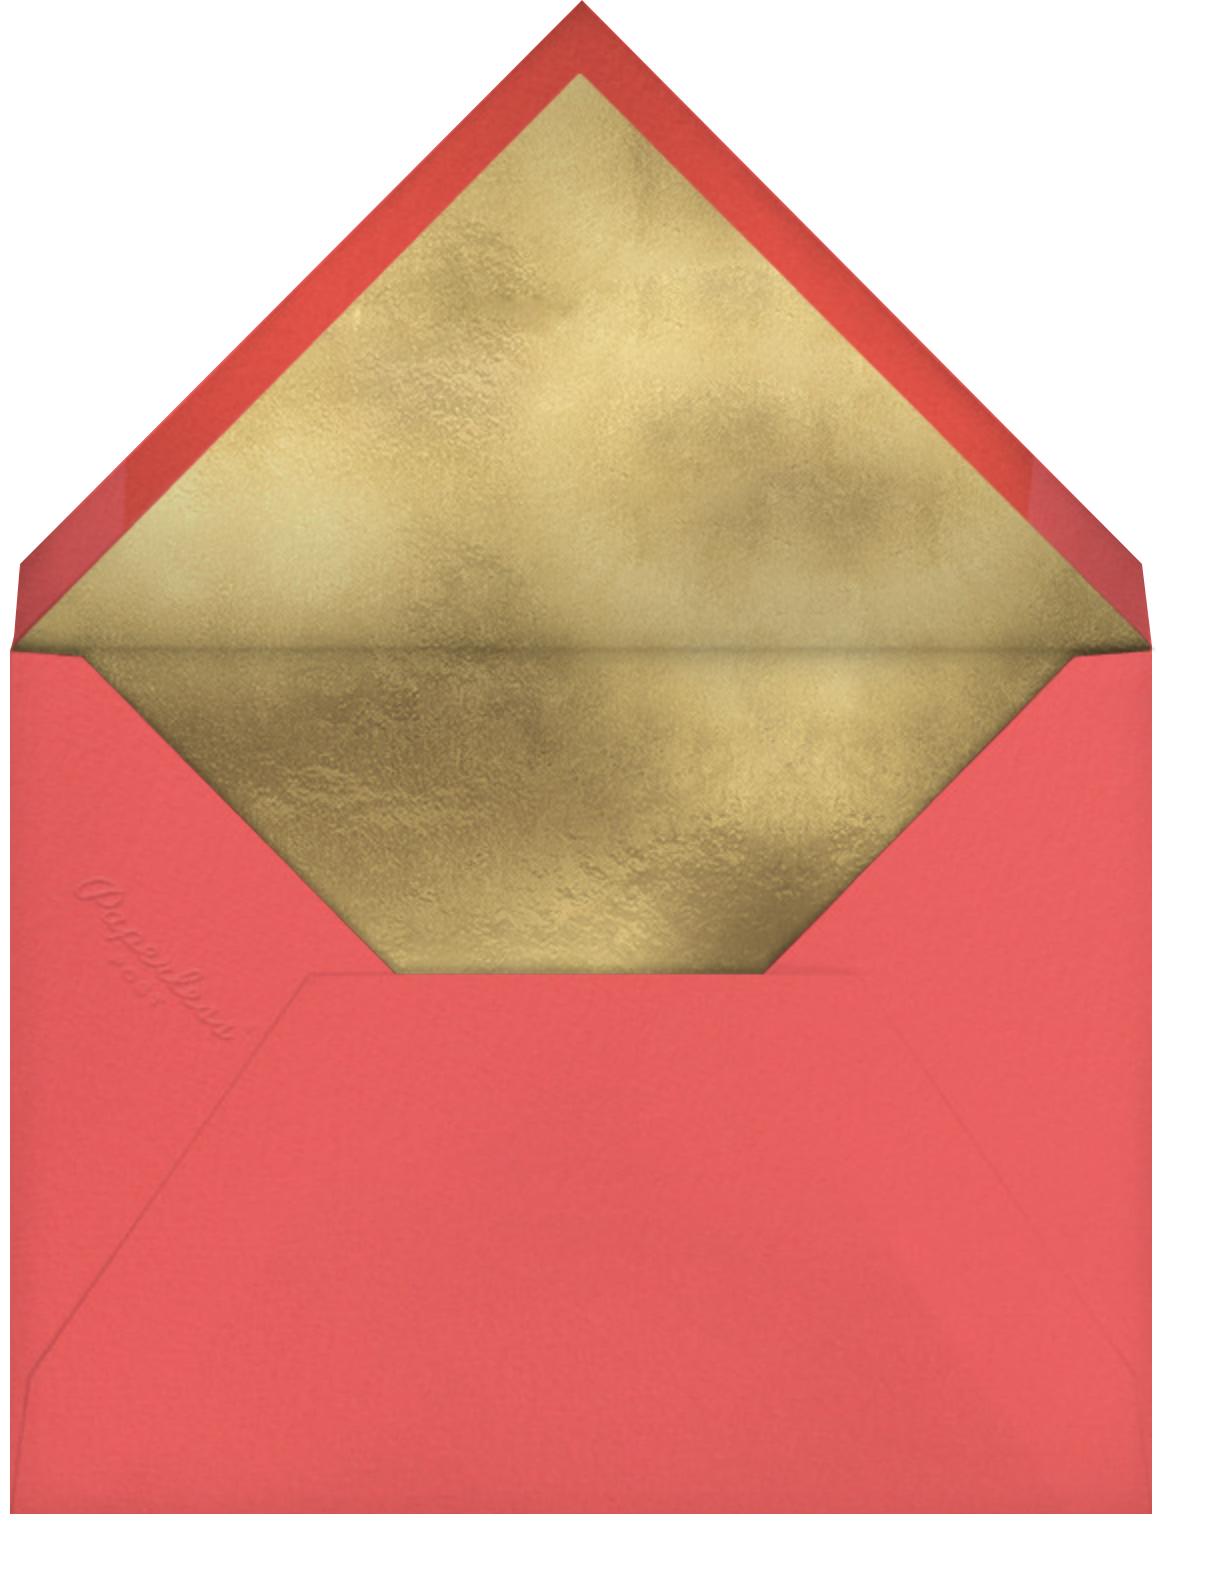 Grateful Foliage (Danielle Kroll) - Red Cap Cards - Thank you - envelope back